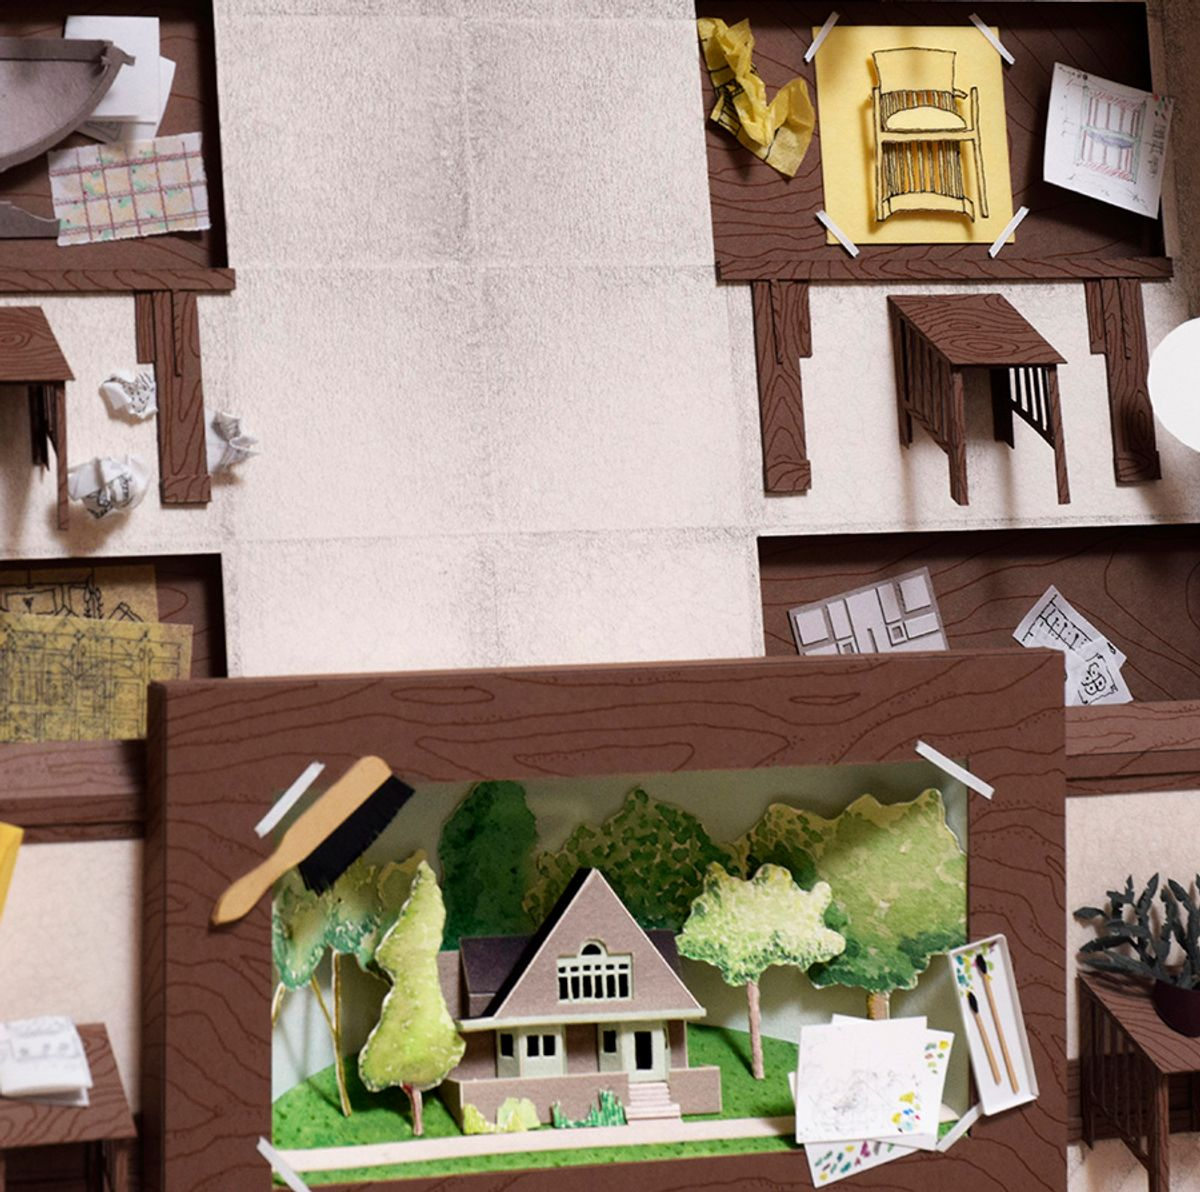 frank Lloyd Wright Home studio